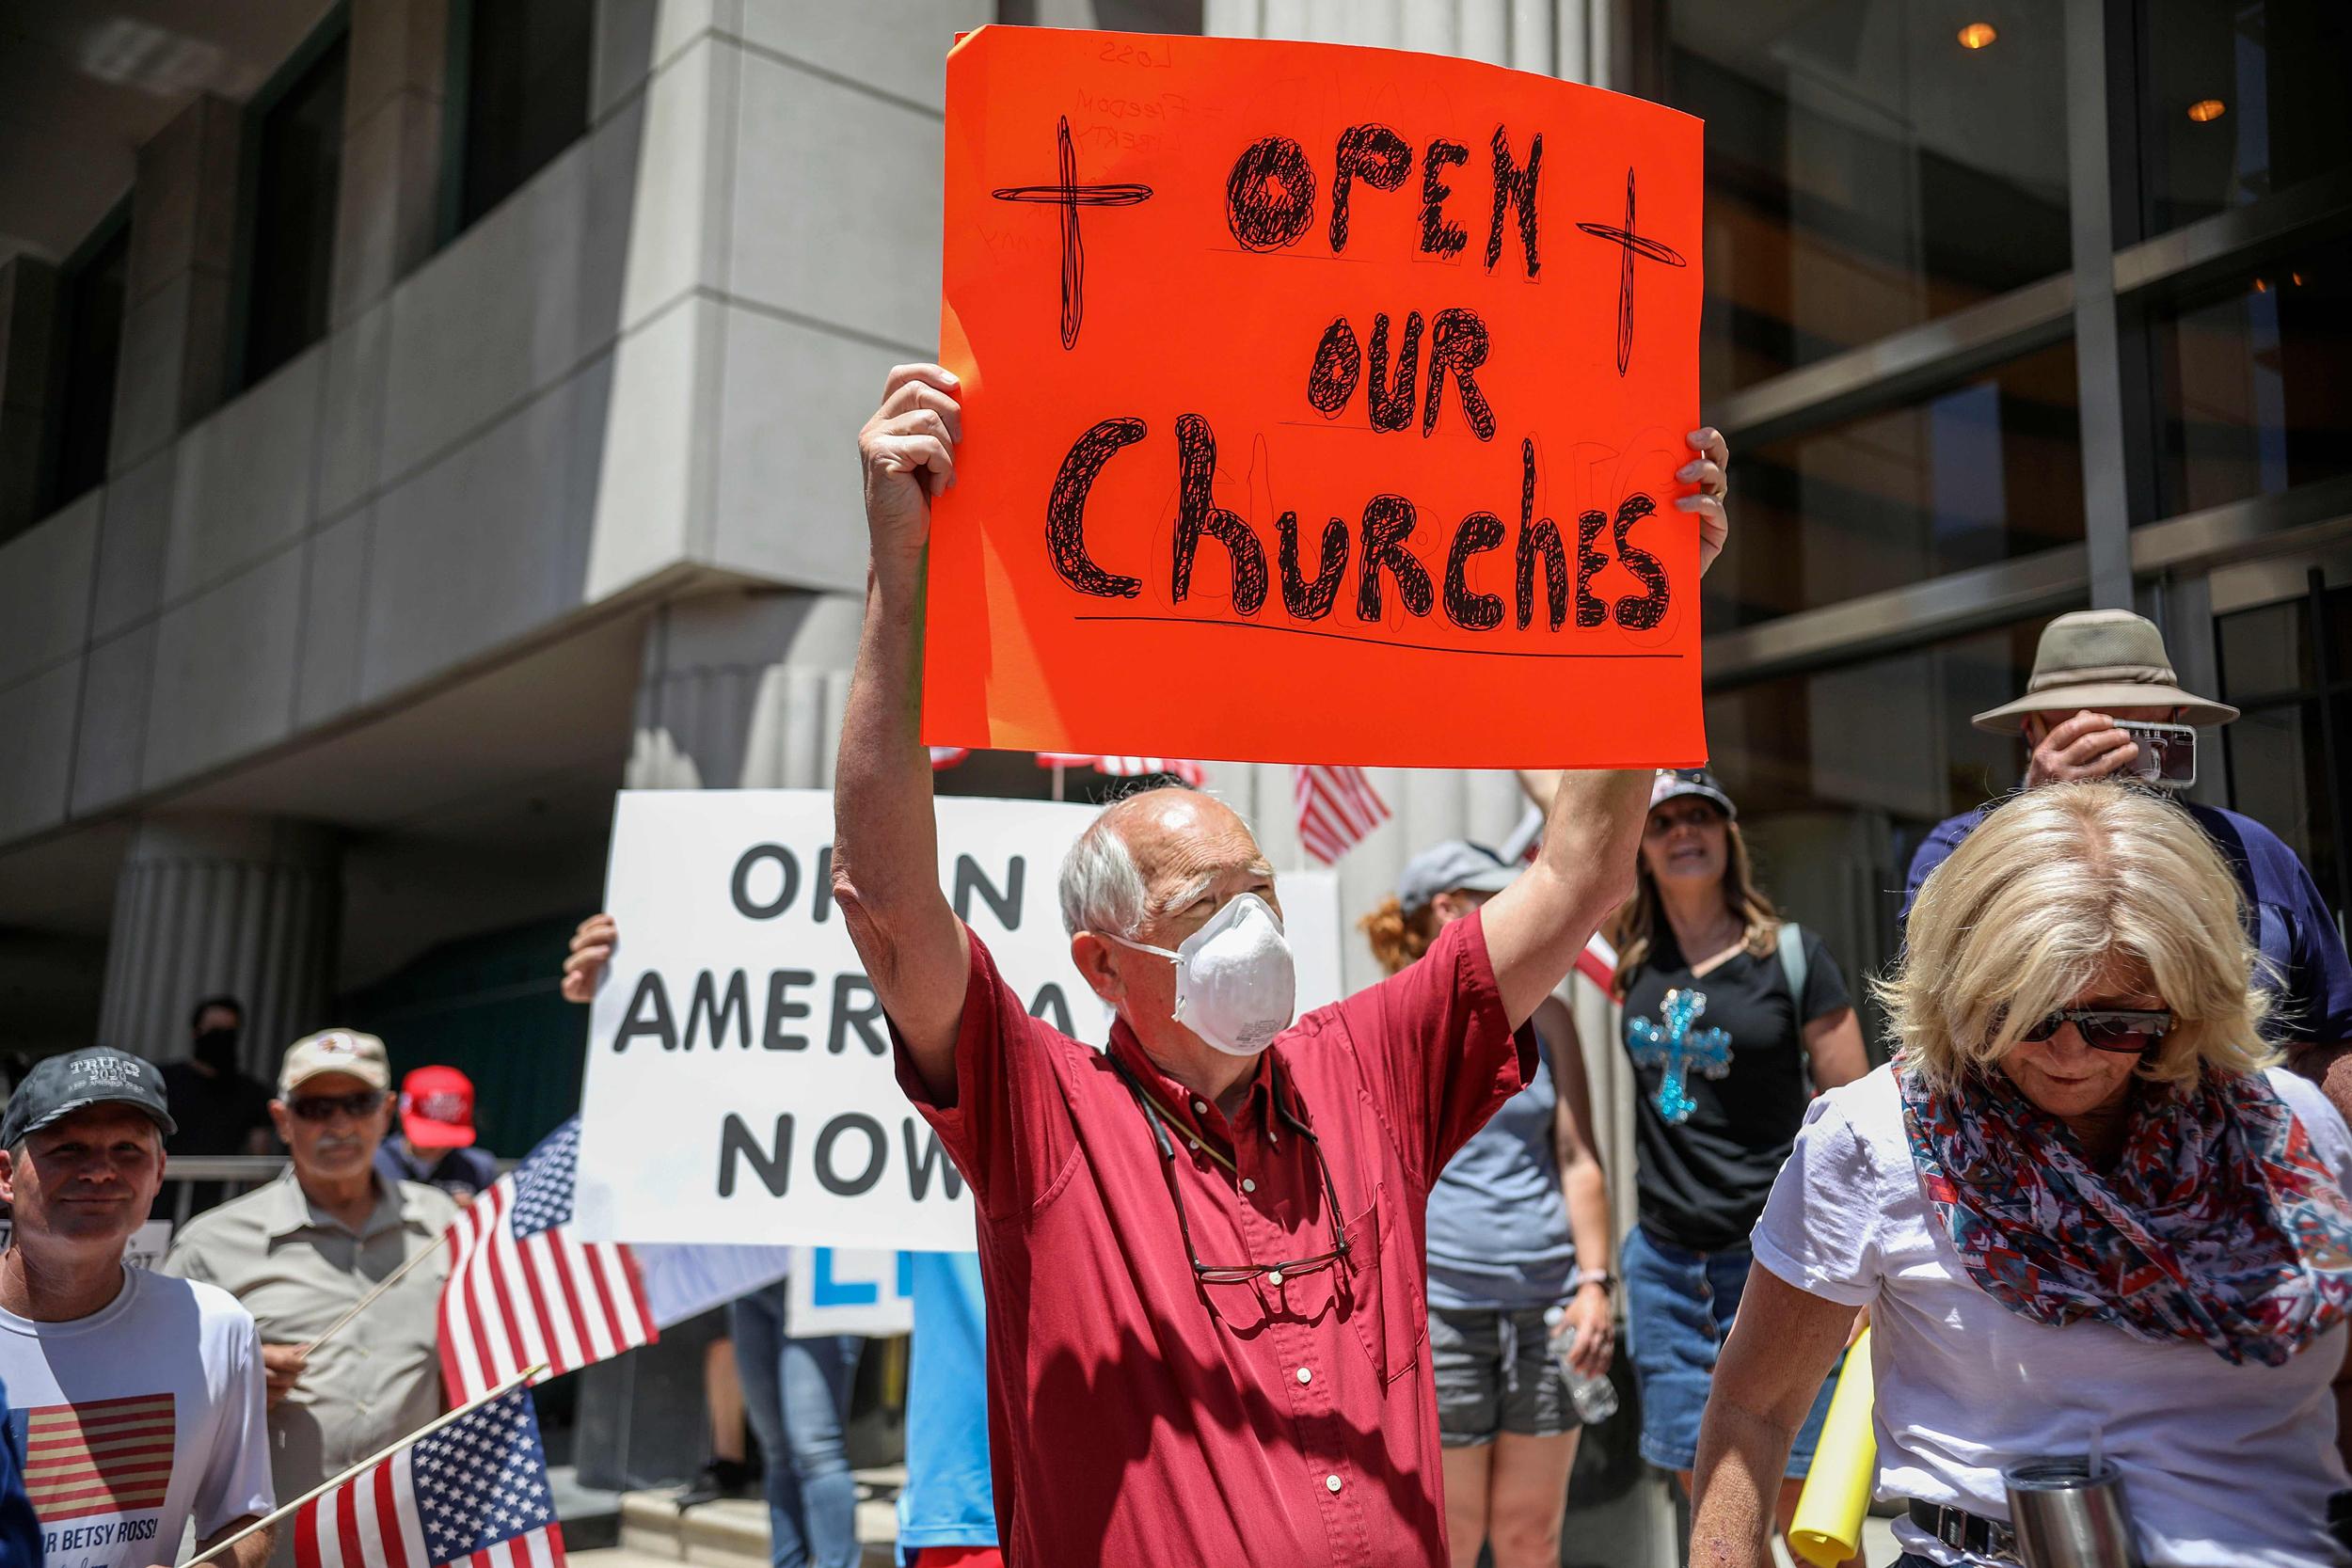 Is the Coronavirus, God's punishment on man? - the anti-church virus